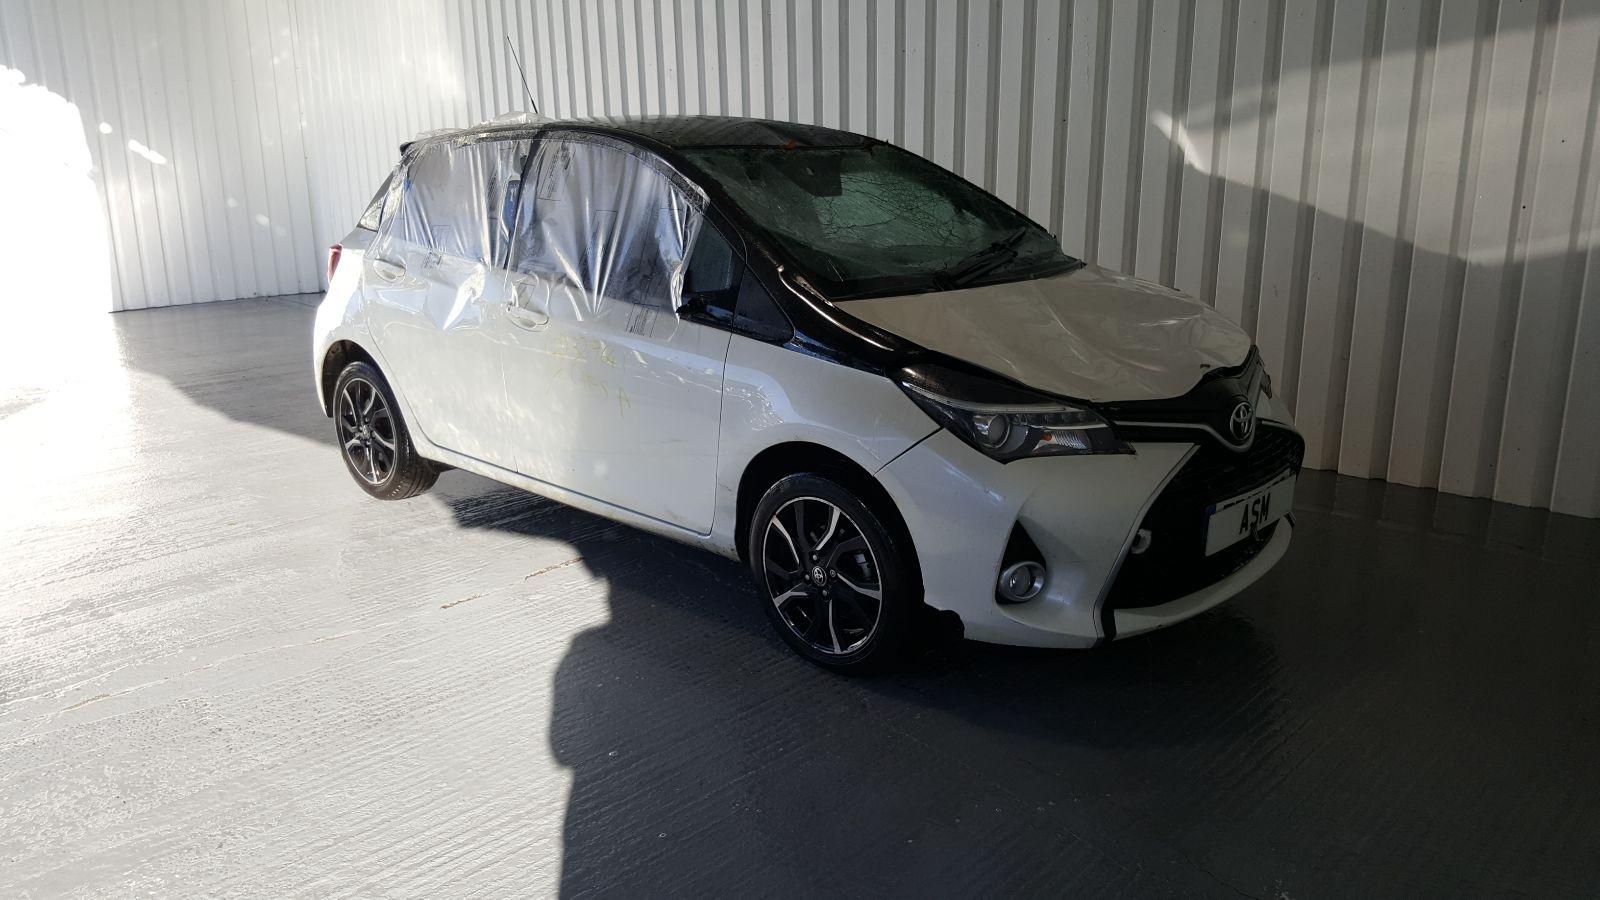 Image for a 2017 Toyota Yaris 1.3 Petrol 1NR-FE Engine